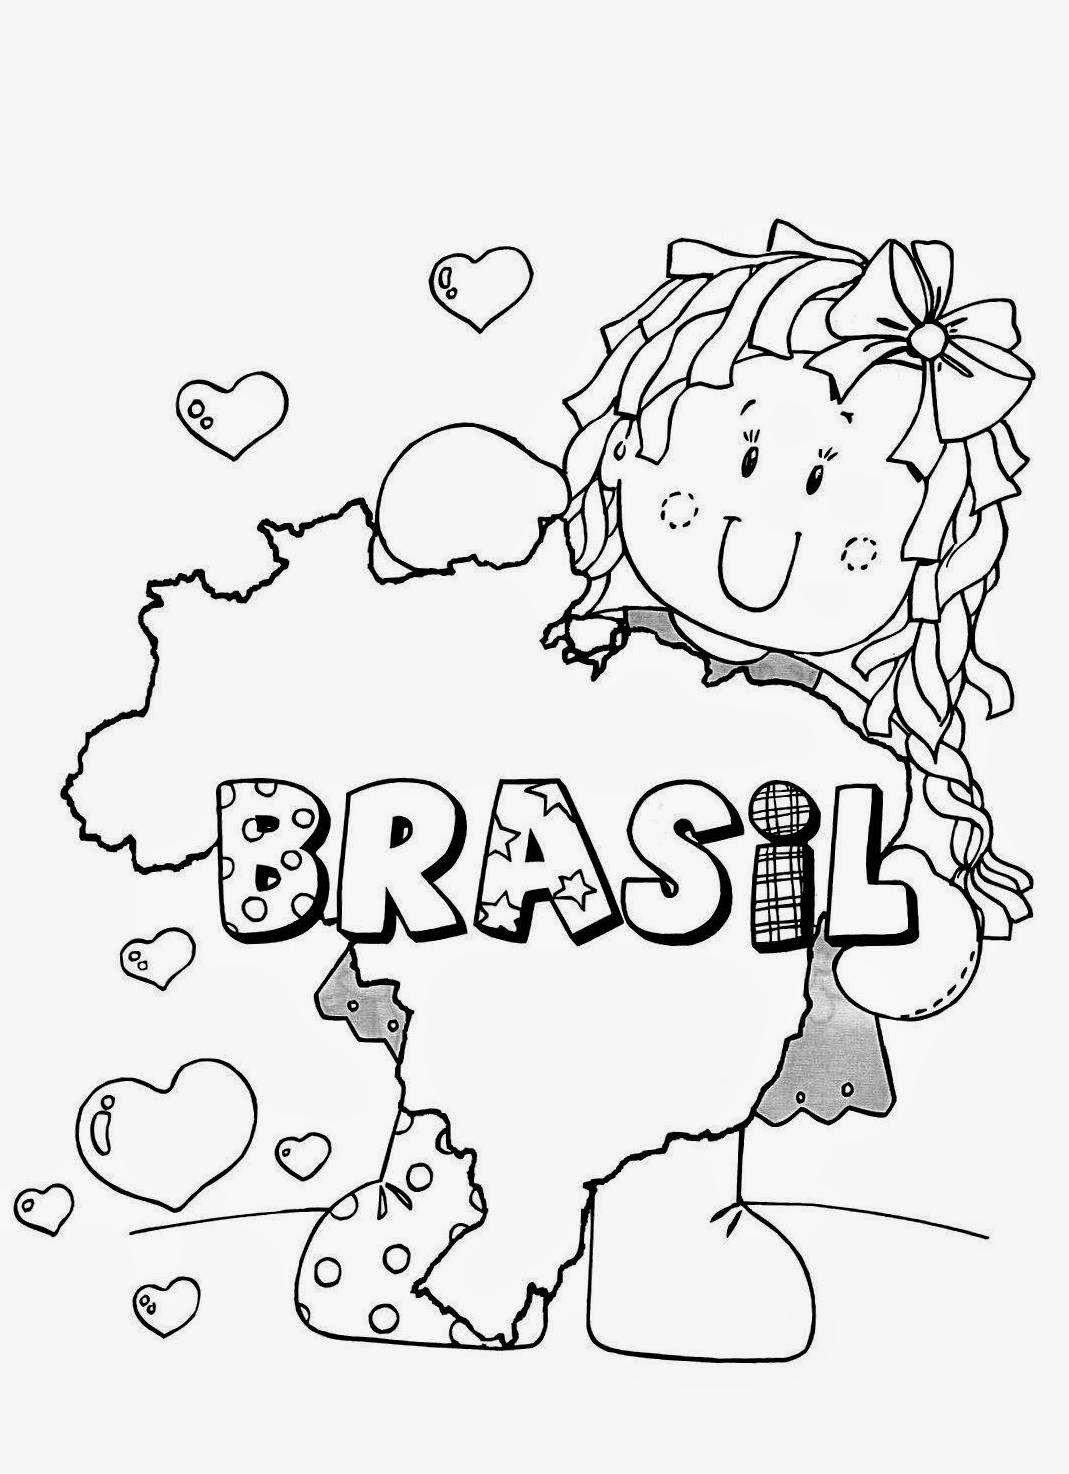 Bandeira do Brasil para Colorir Colorir Online - imagens para colorir bandeira do brasil